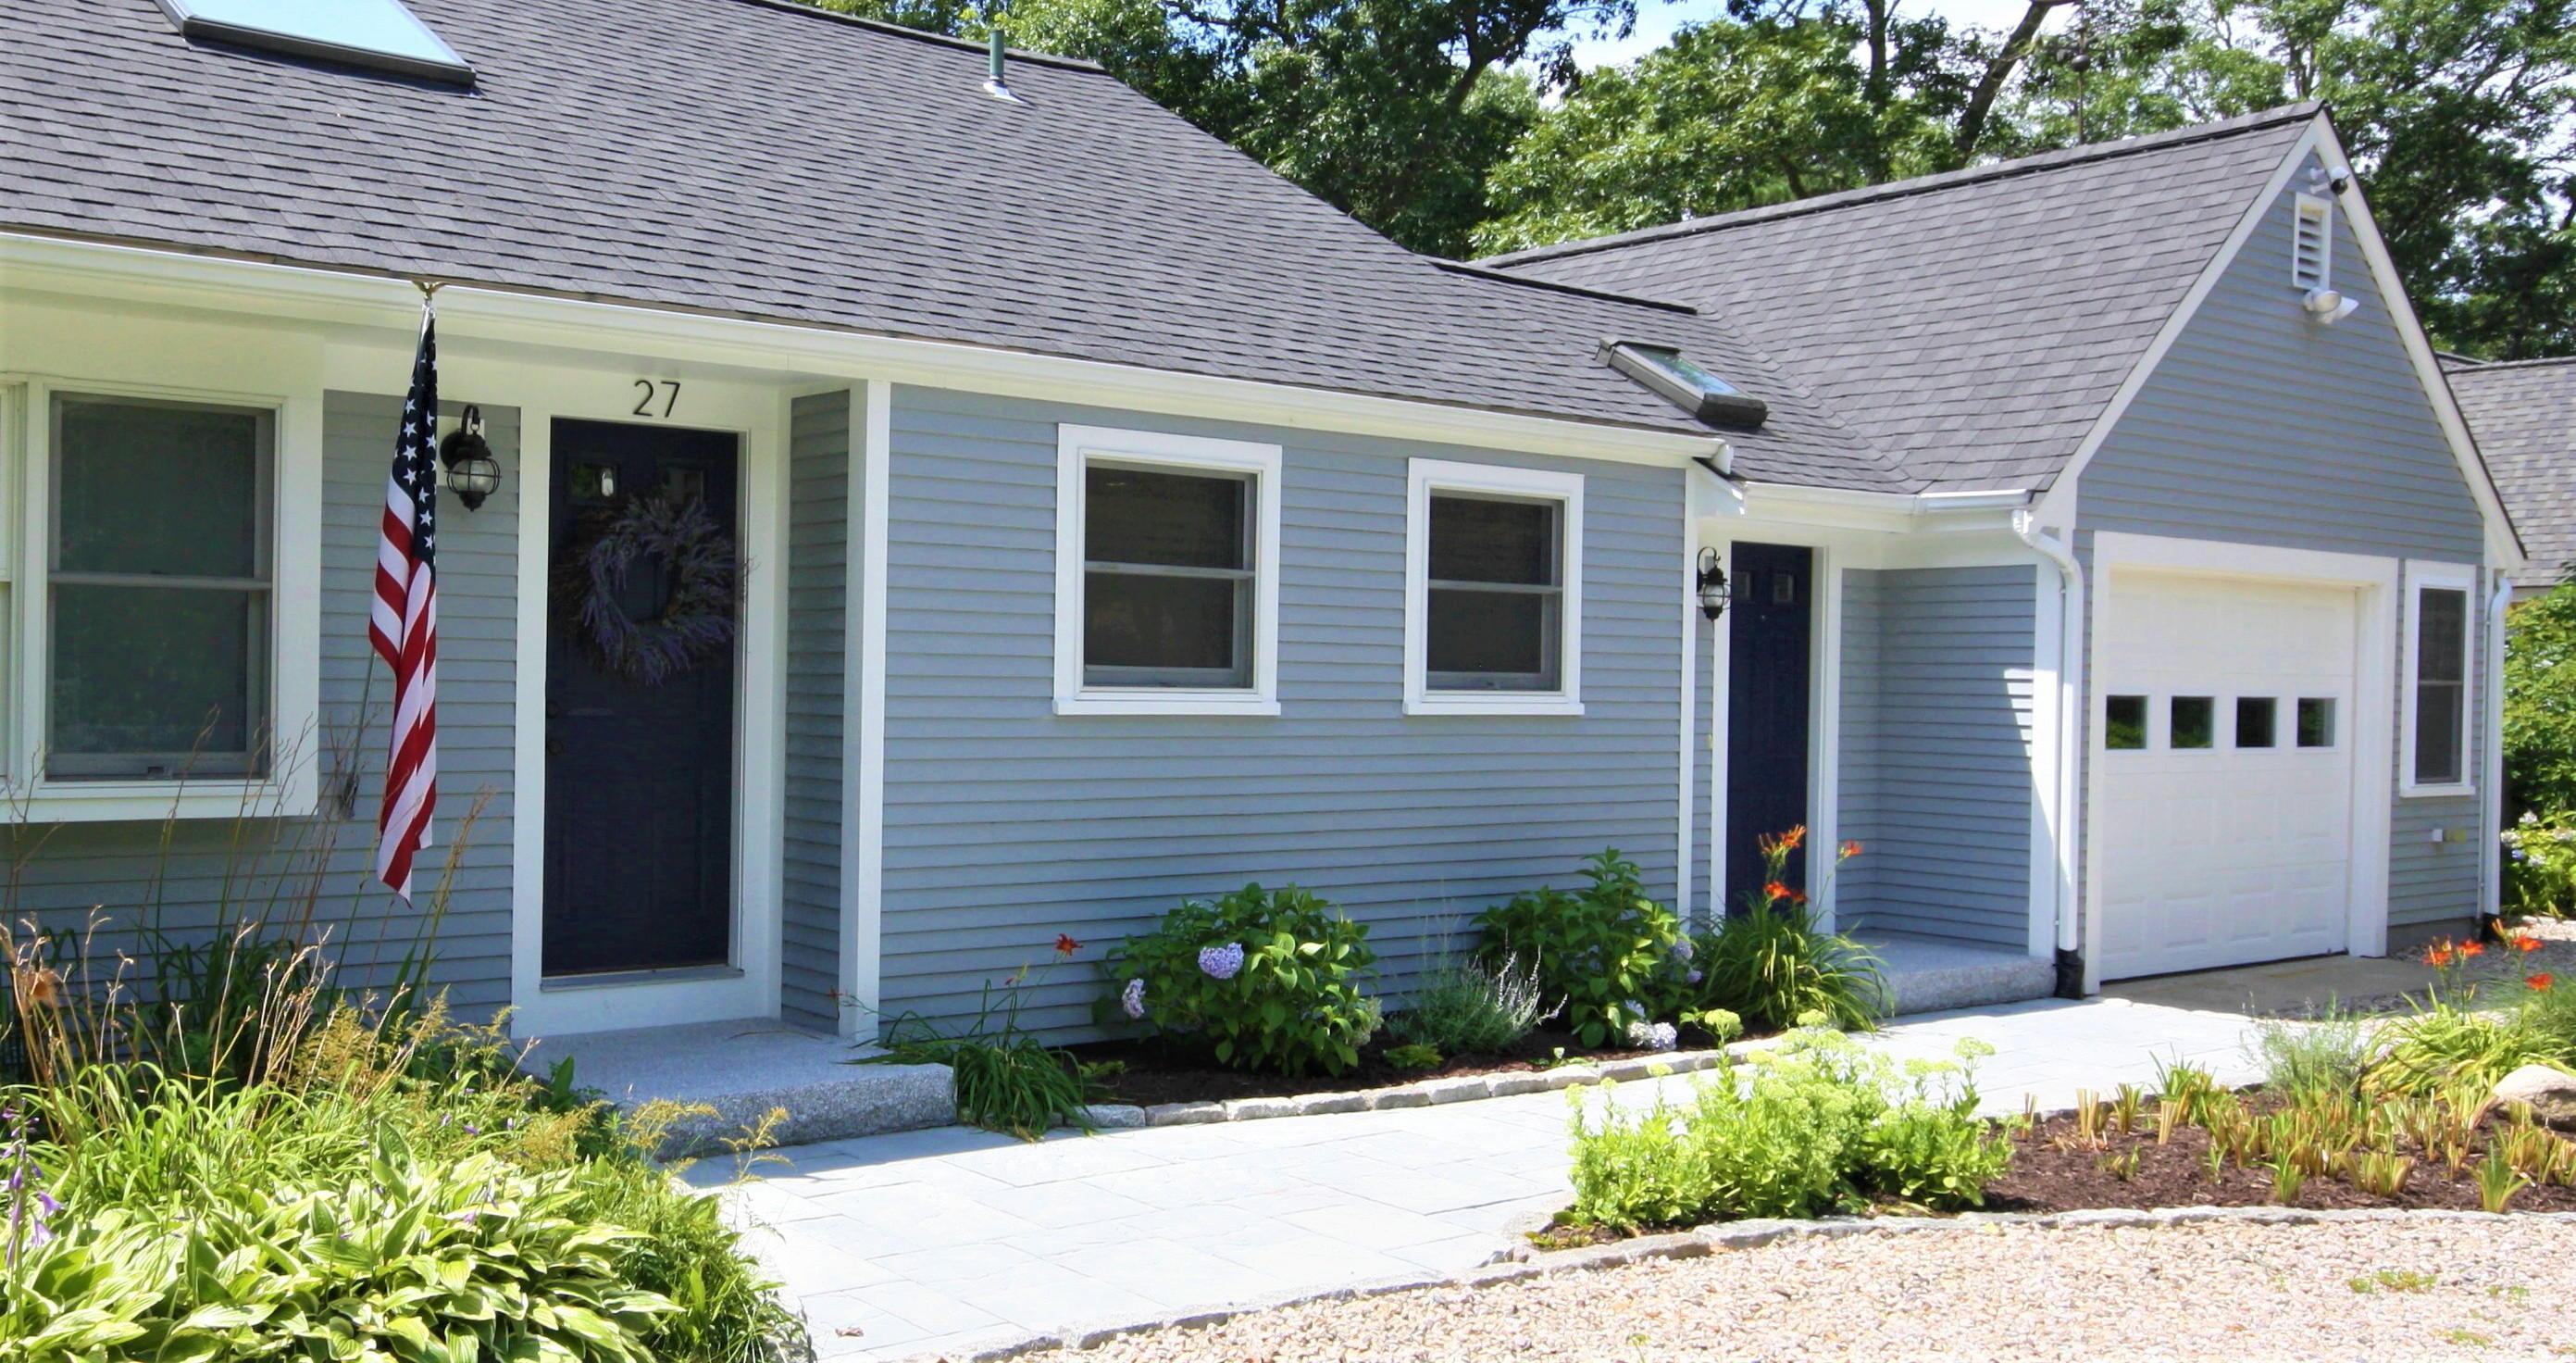 27 Beach Rose Lane, Brewster MA, 02631 sales details